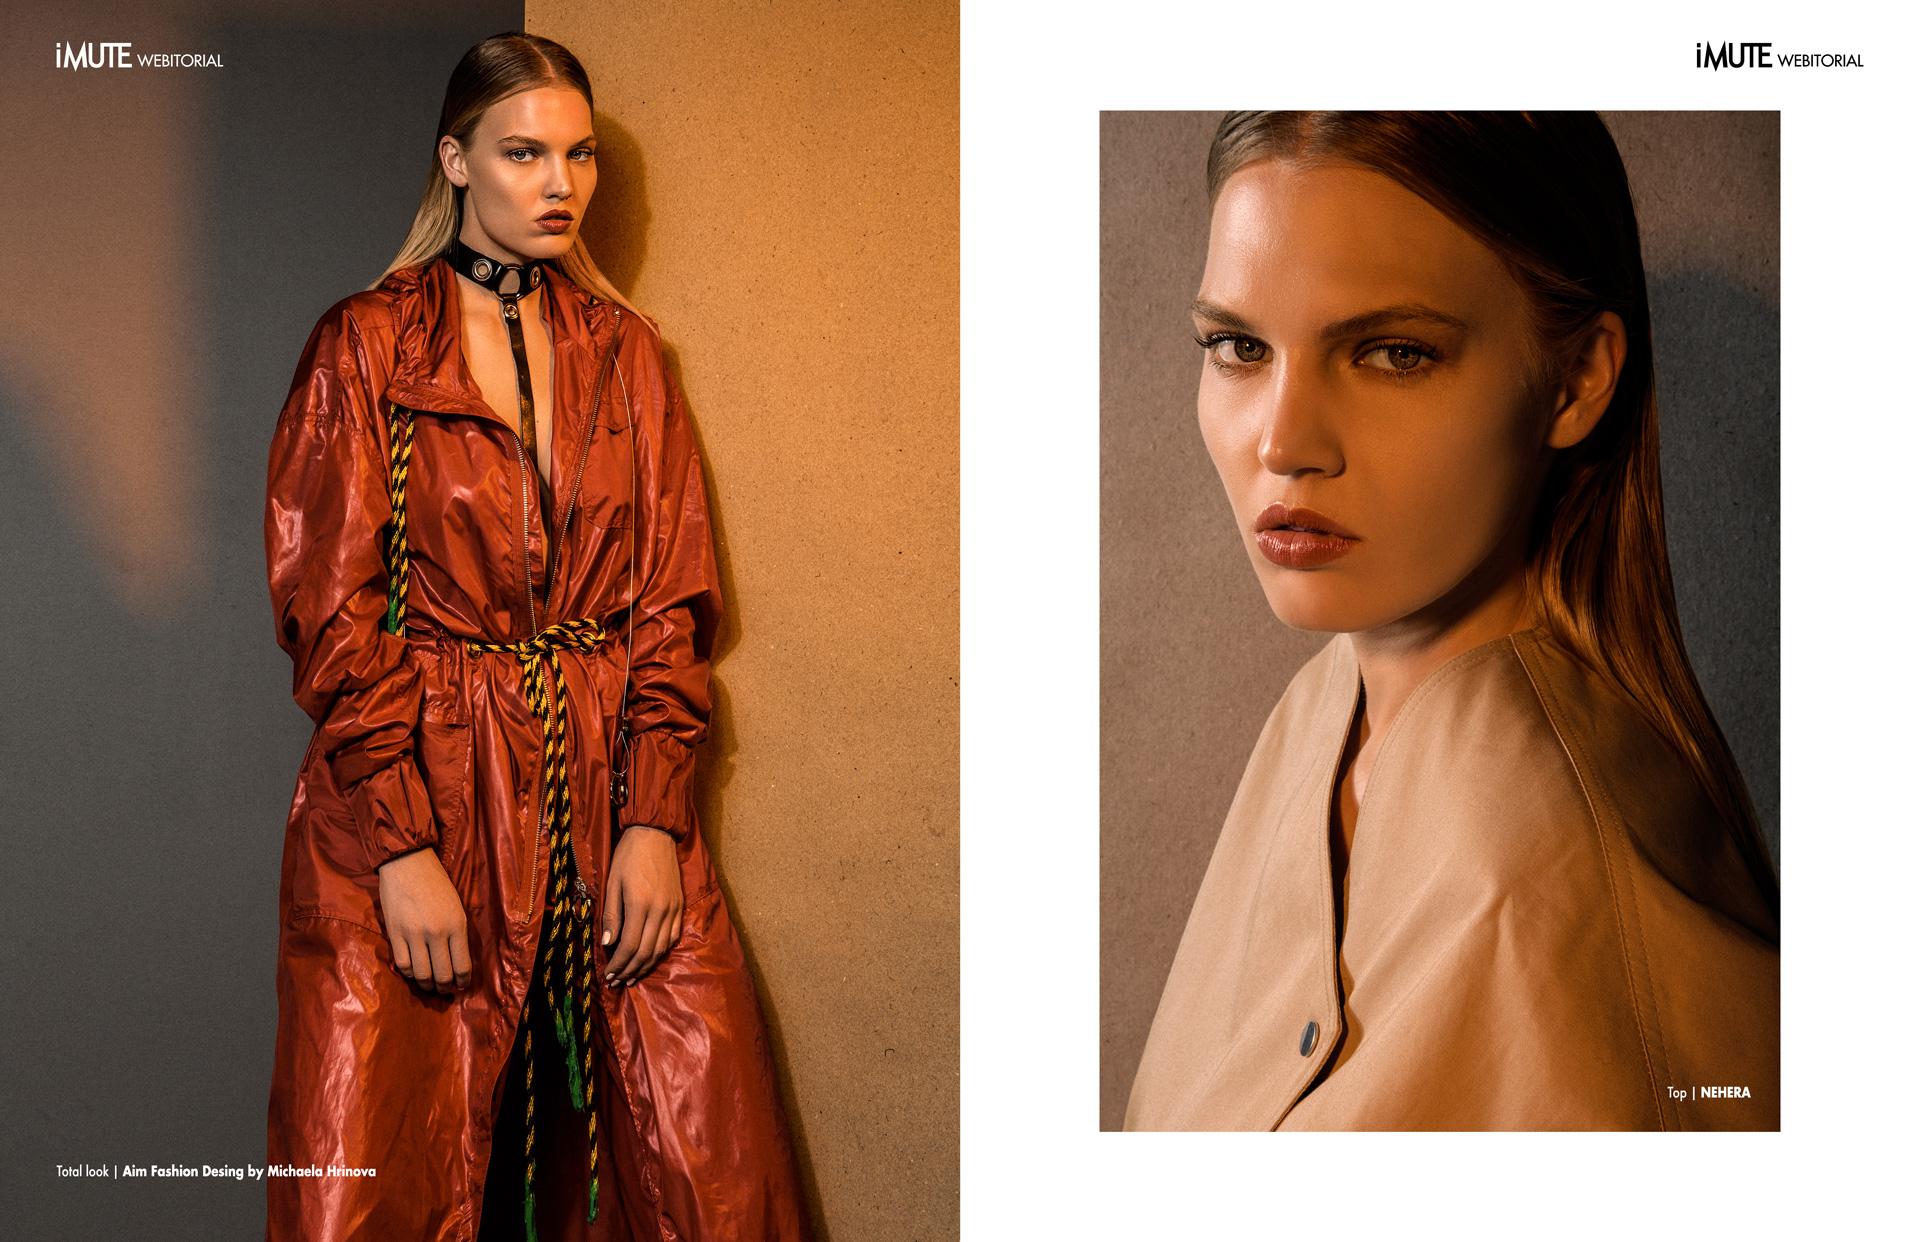 TEMPERATE webitorial for iMute Magazine Photographer | Tomas Thurzo Model | Kristina K. @ Exit Model Management Stylist | Dominika Svetikova Makeup & Hair | Alena Zahorska